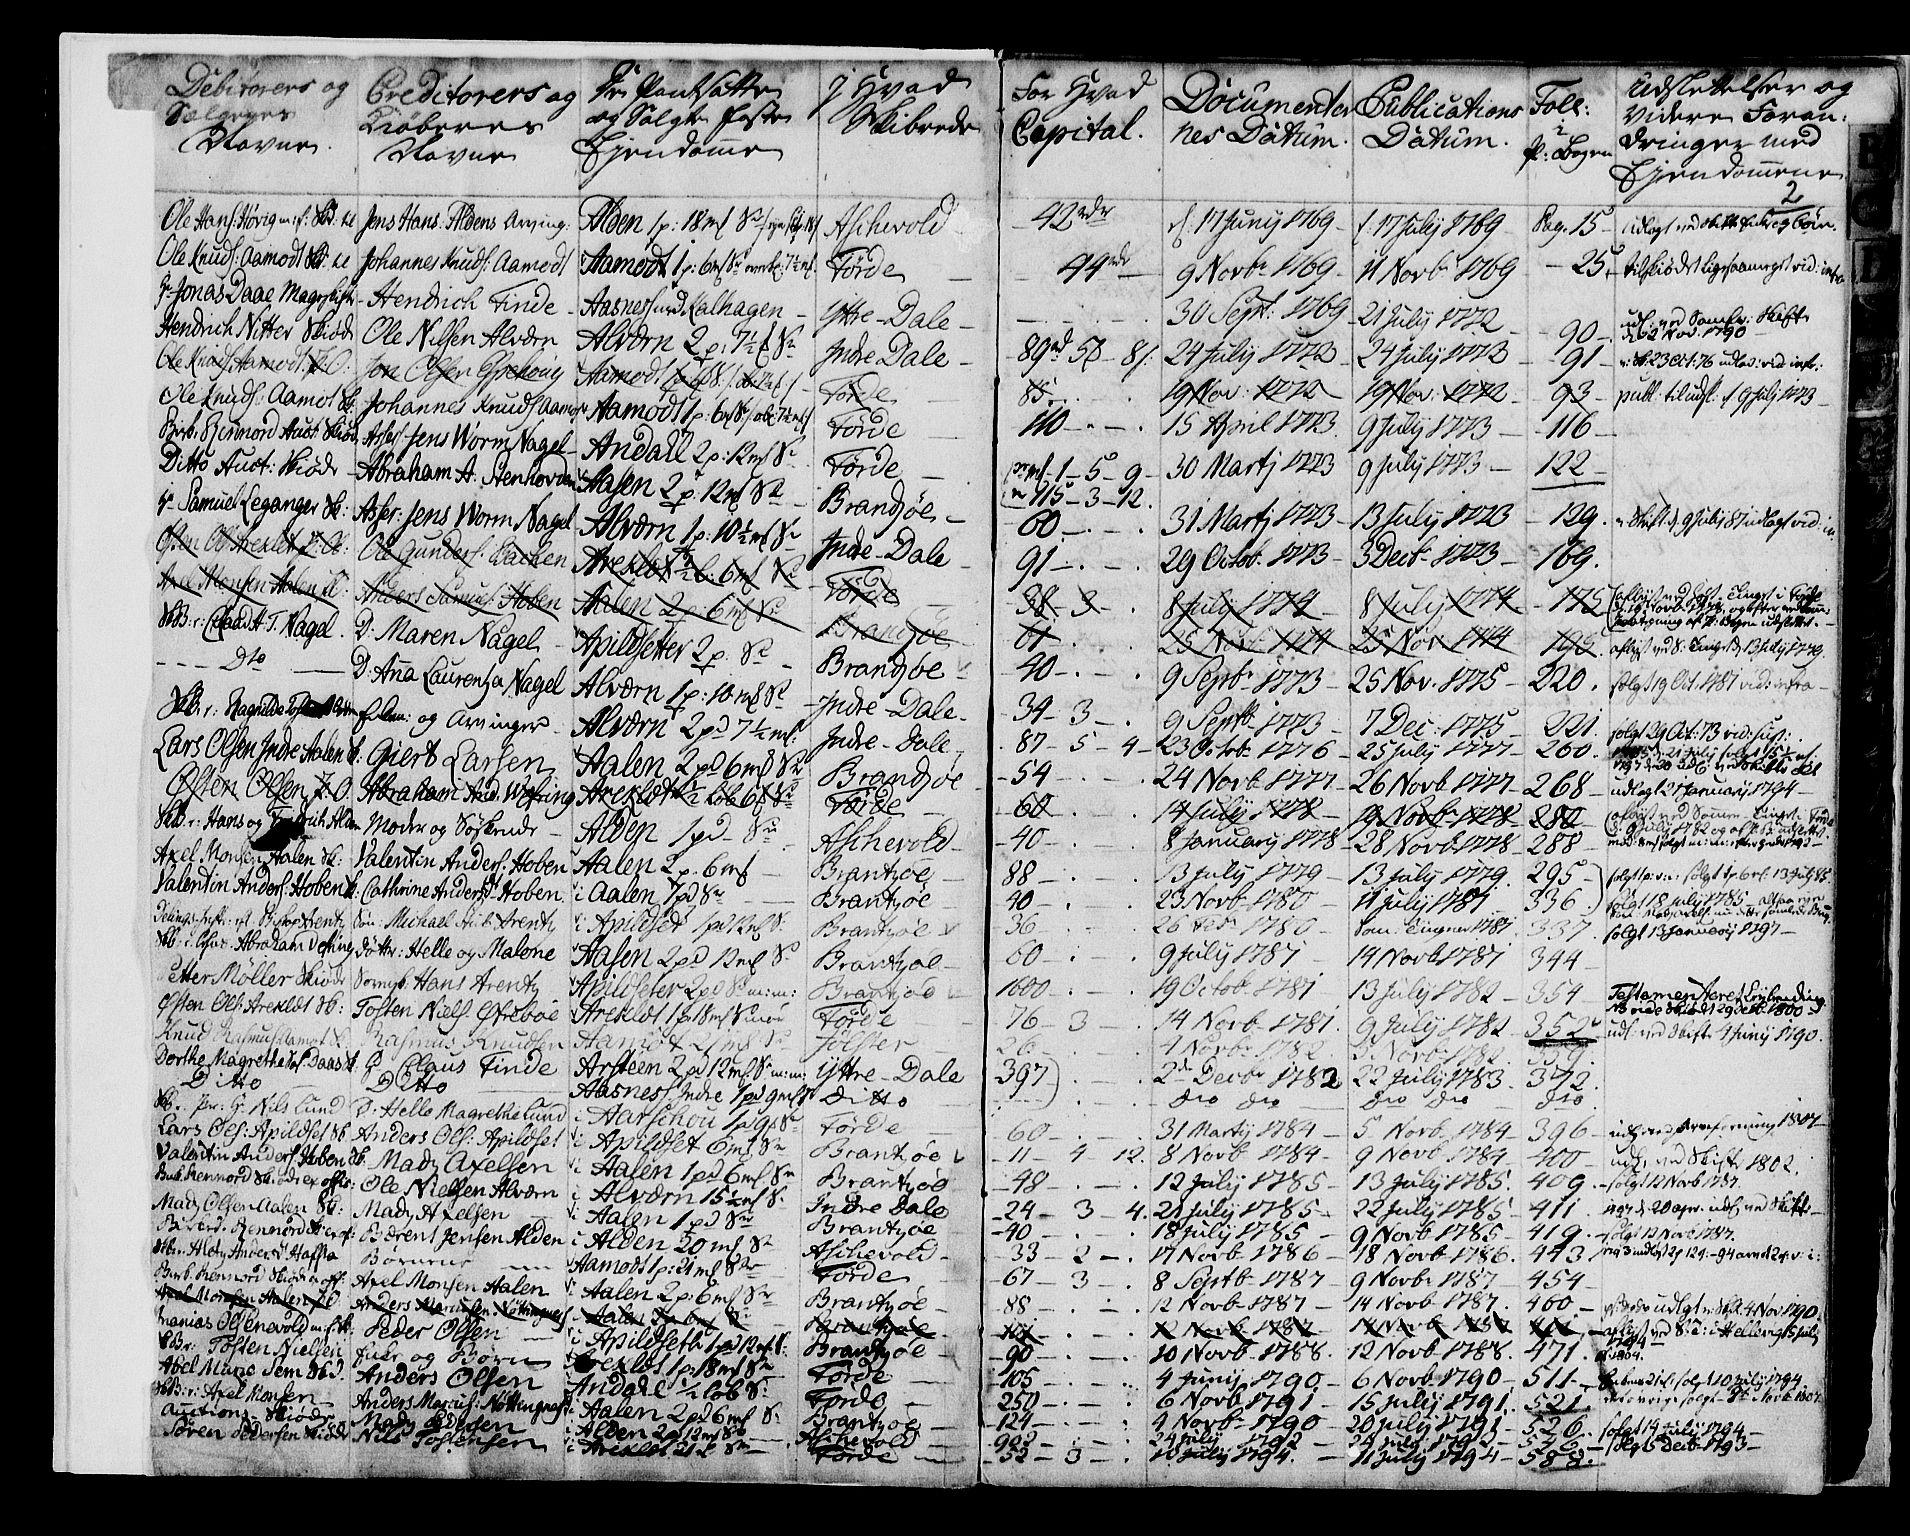 SAB, Sunnfjord tingrett, G/Gb/Gba/L0007c: Pantebok nr. II.B.7c, 1769-1806, s. 2